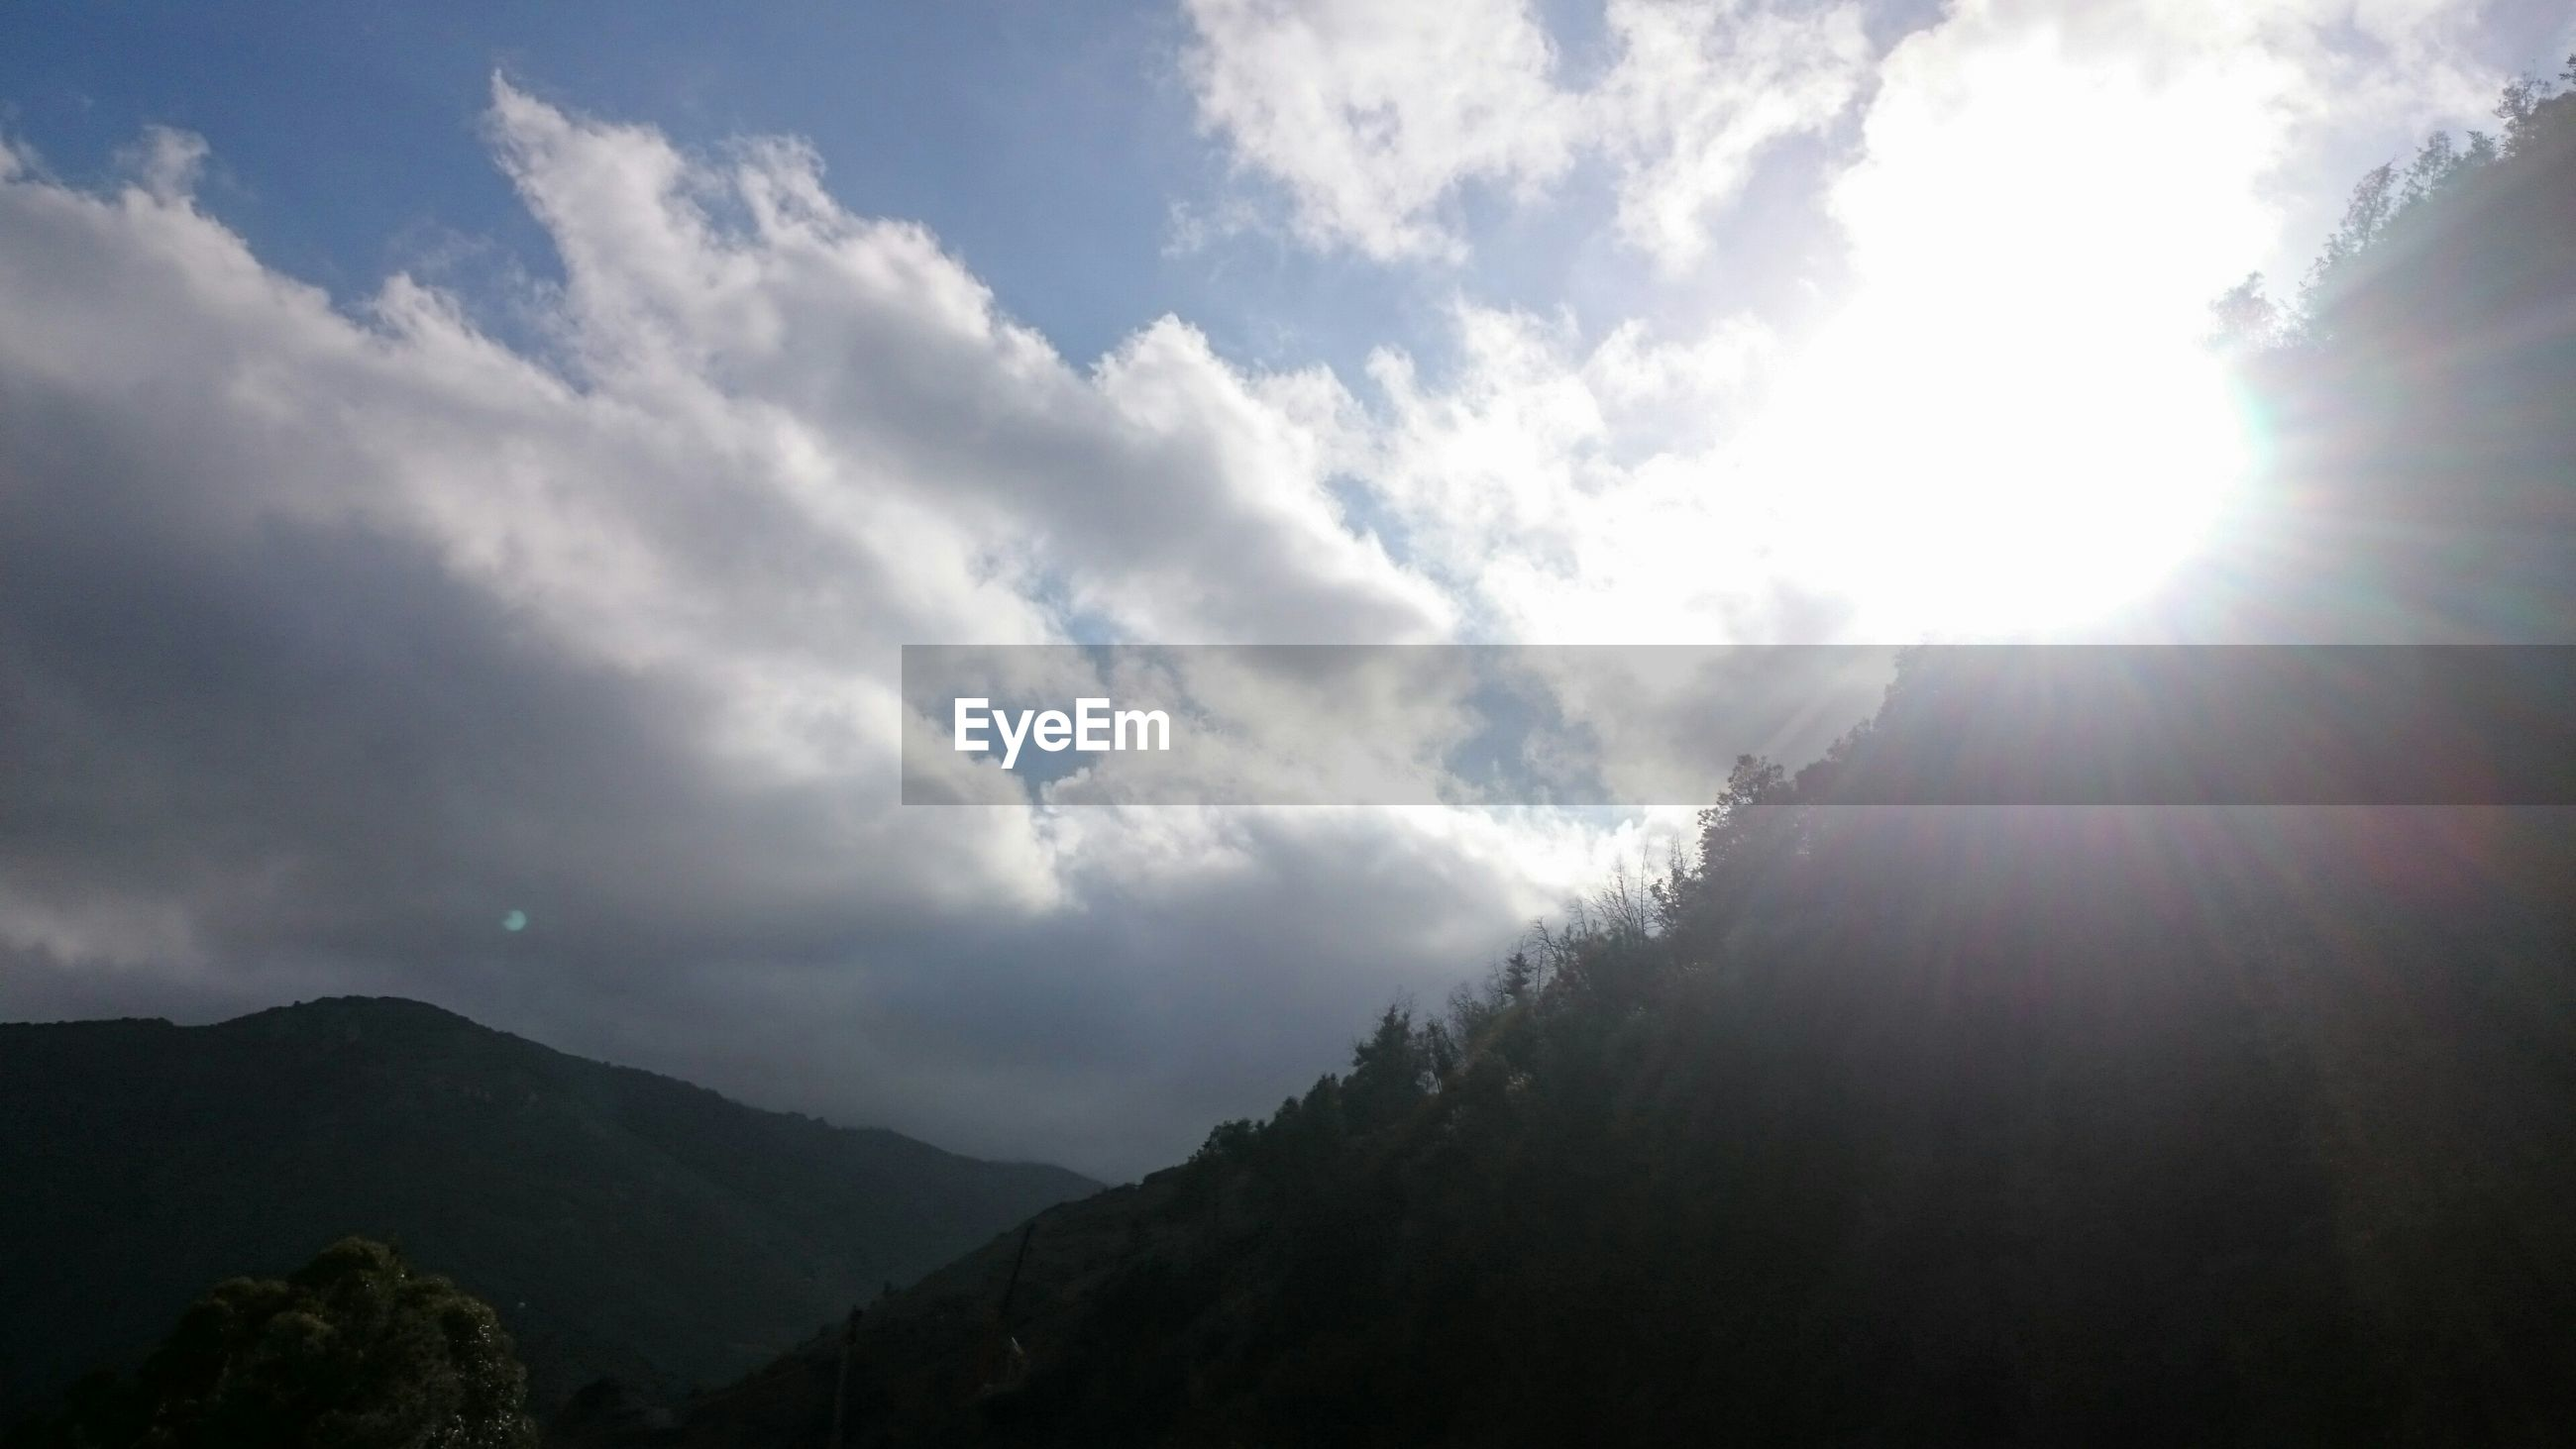 mountain, tranquil scene, tranquility, sun, scenics, sky, beauty in nature, sunbeam, sunlight, nature, mountain range, cloud - sky, landscape, lens flare, idyllic, cloud, silhouette, non-urban scene, tree, outdoors